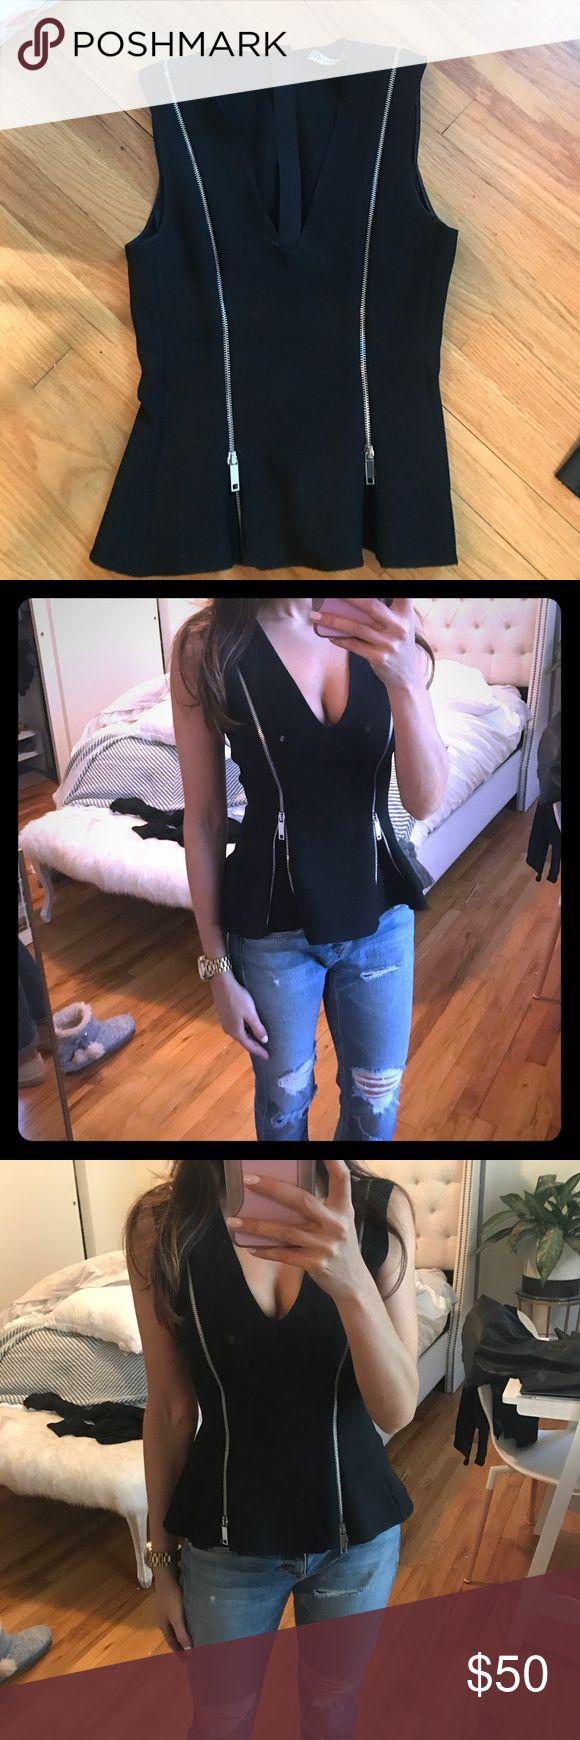 Zara black night out top with adjustable zippers Zara black night out top with adjustable zippers Zara Tops Tank Tops